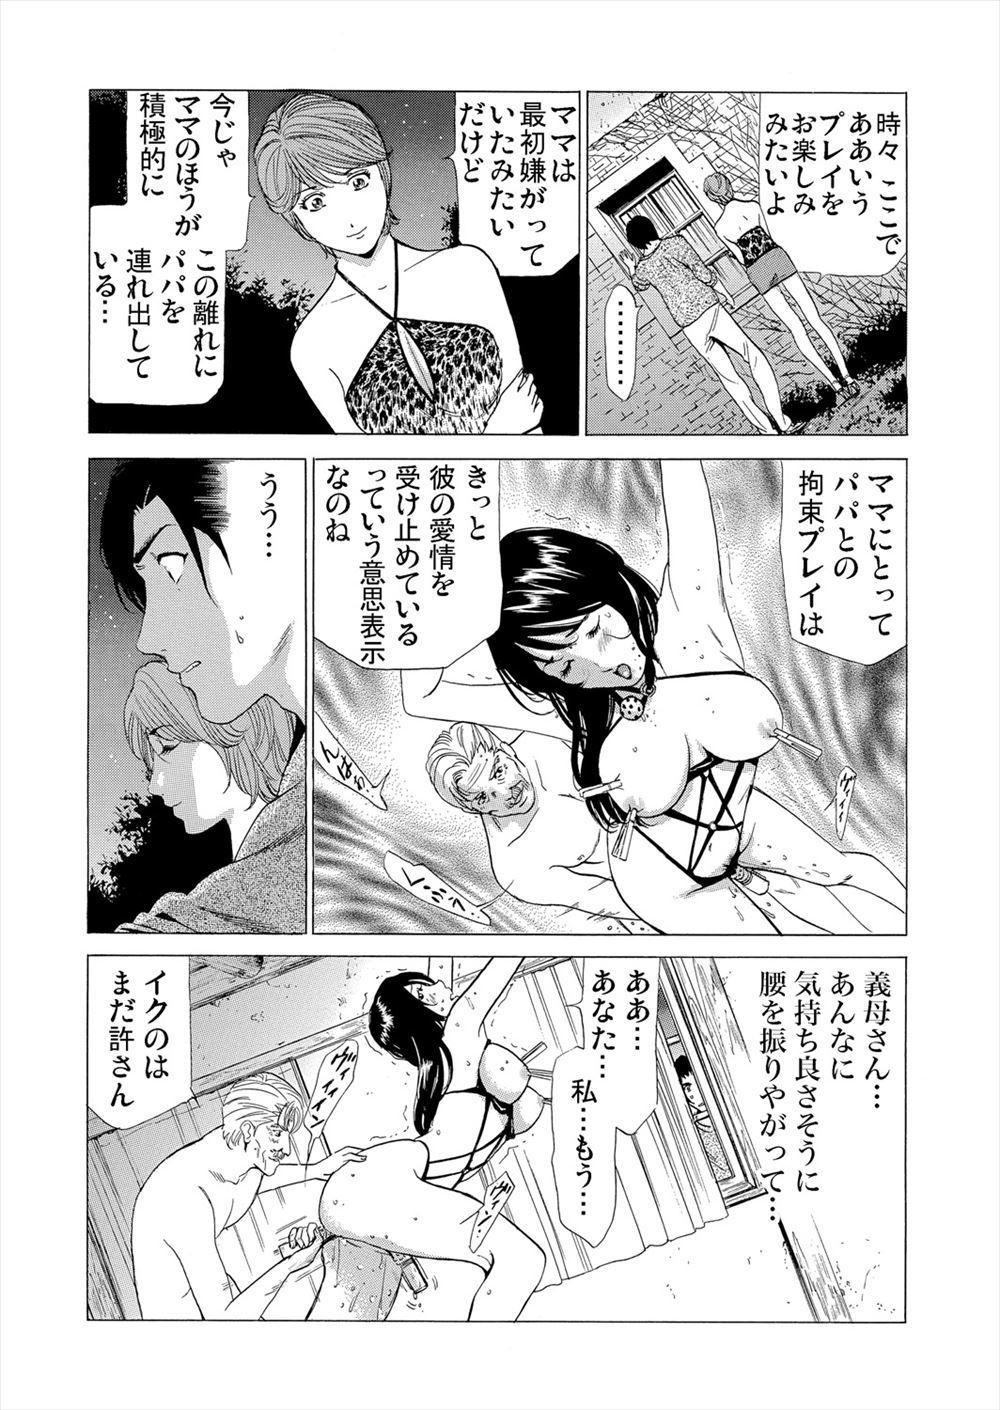 [fonteynart] Gibo netori (Mother-in-law netori) vol.2~ fukushū no yakata 20